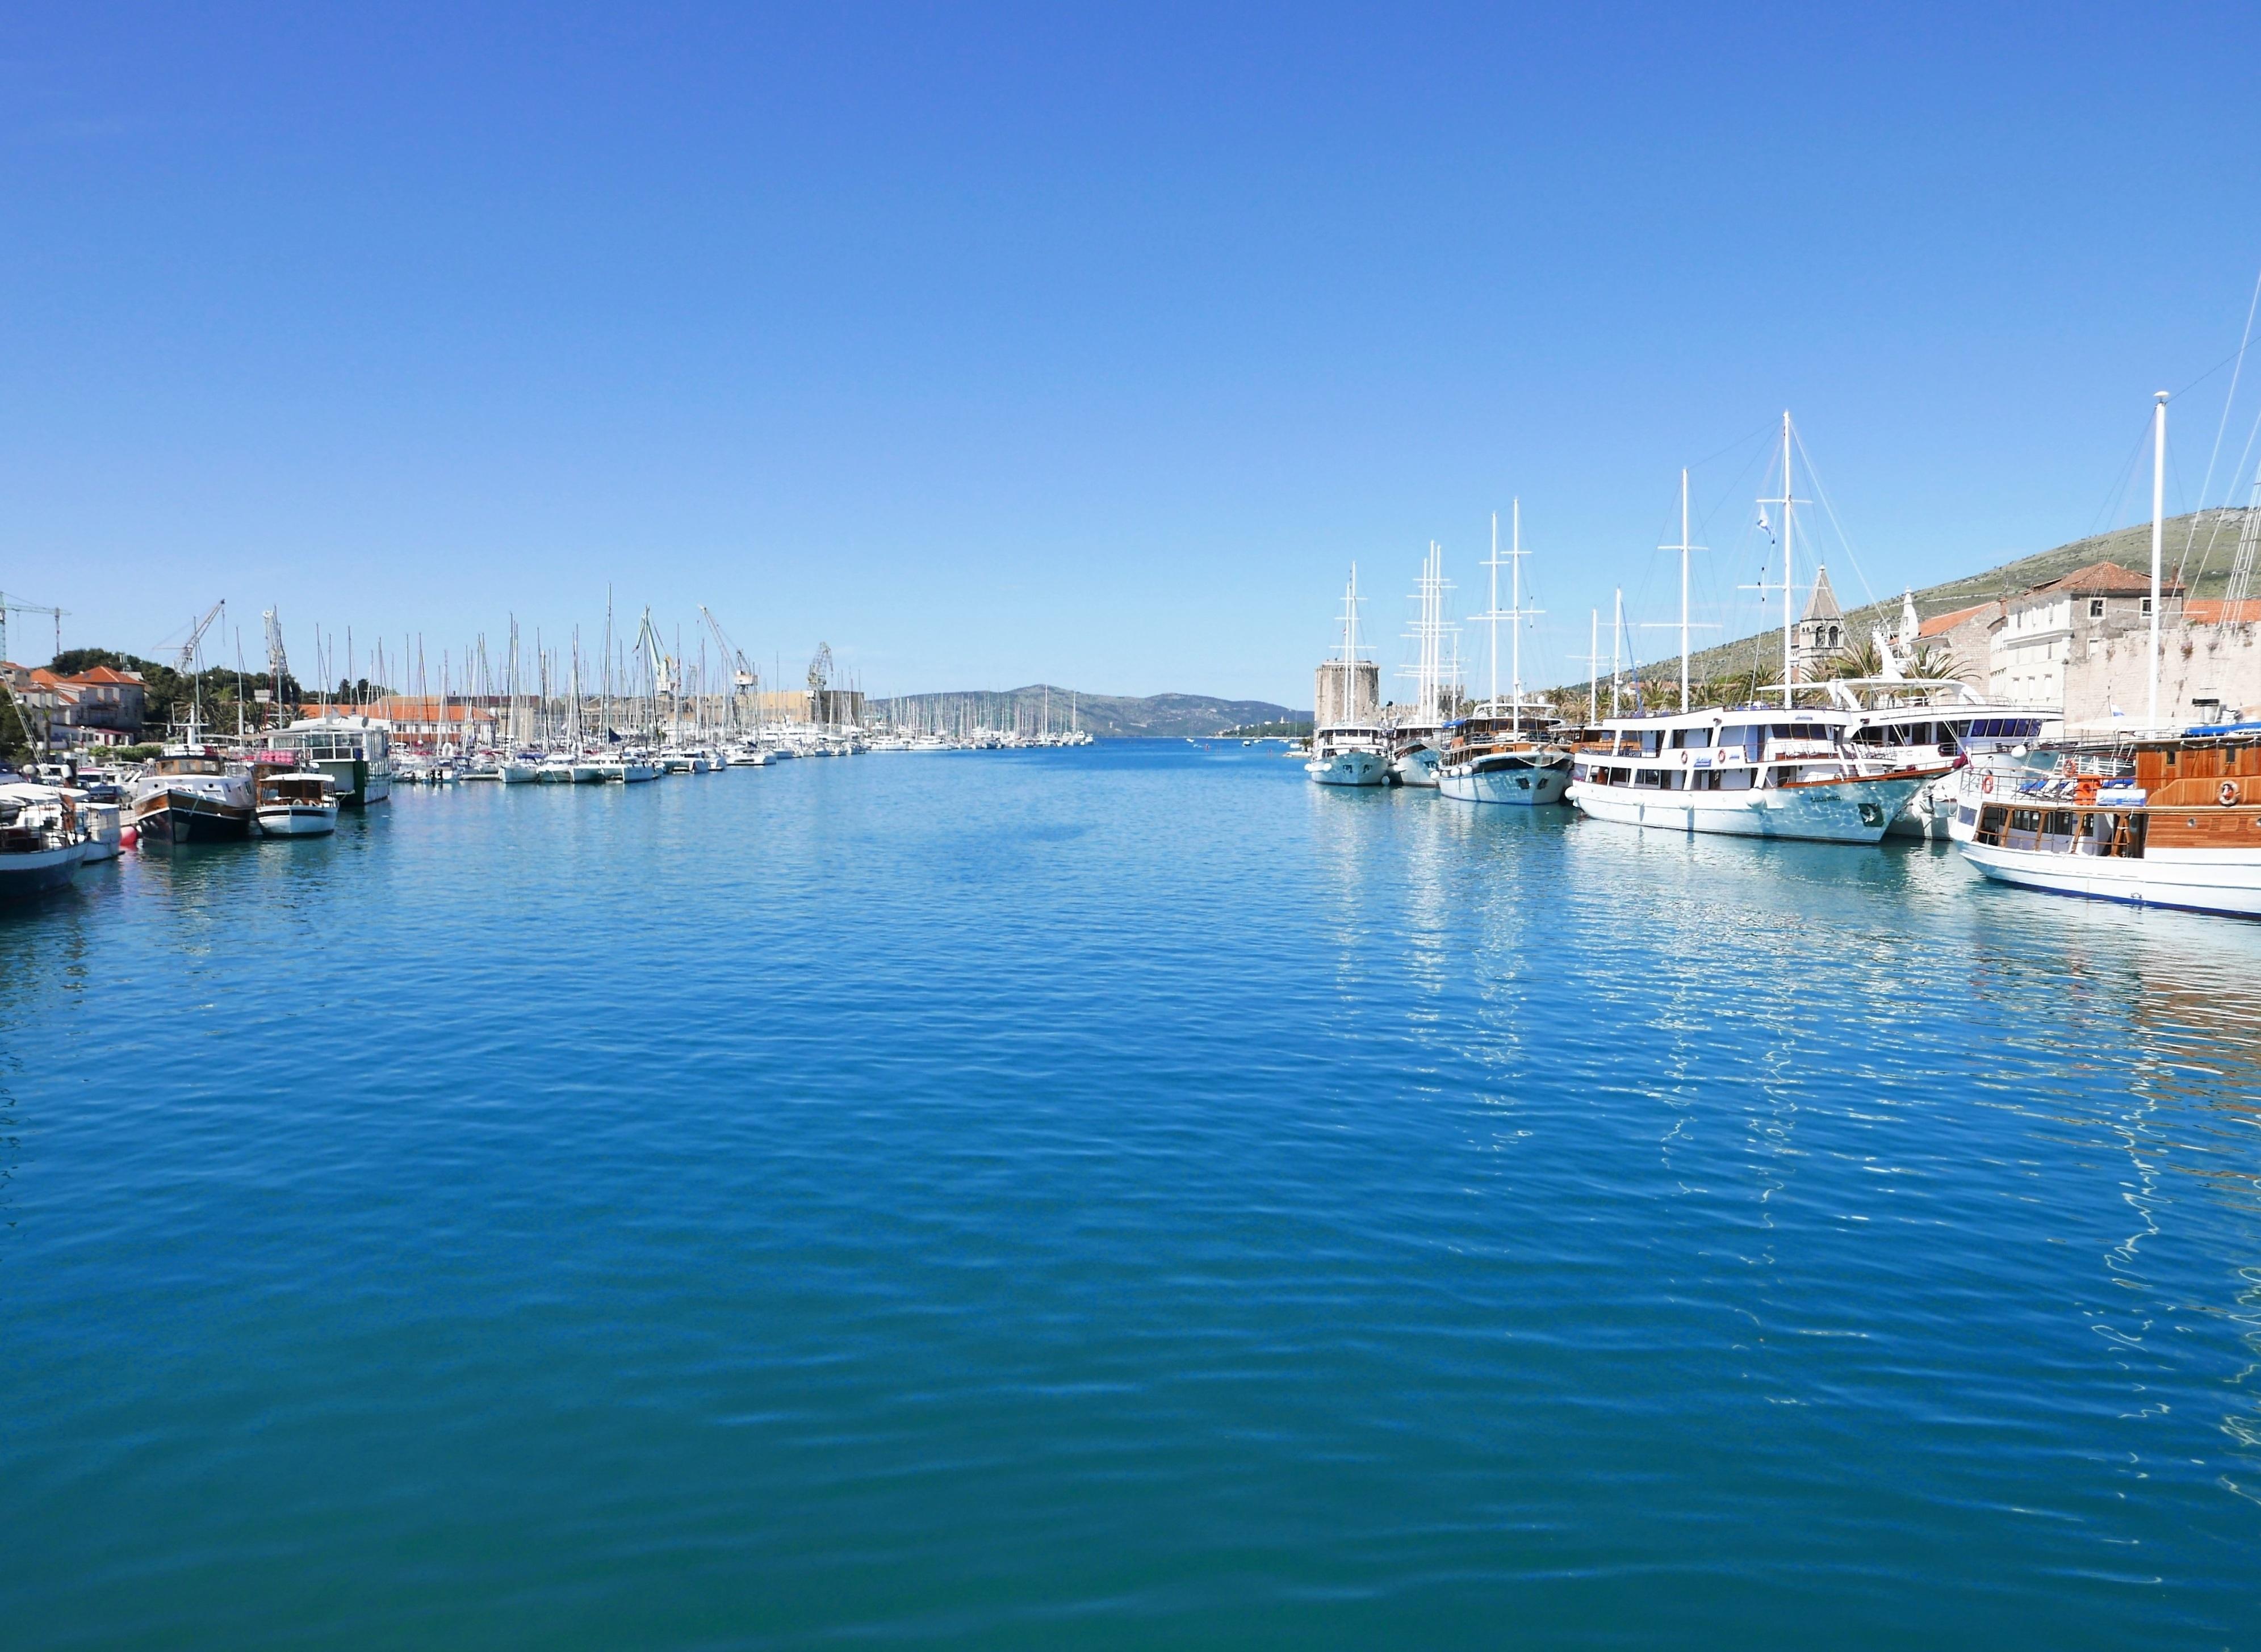 Sea croatia port